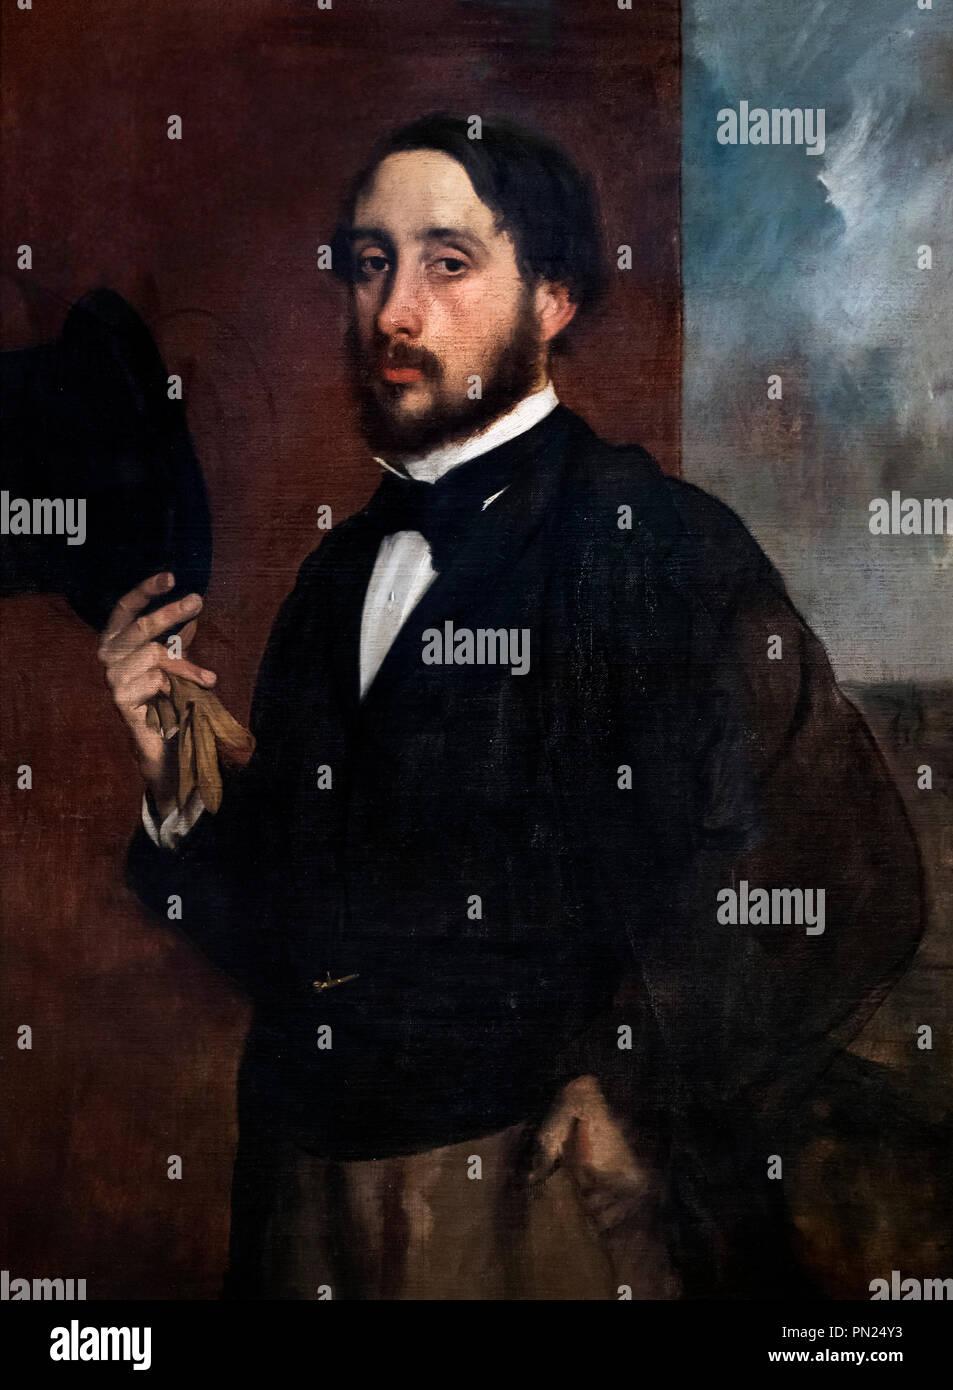 Self-portrait or 'Degas Saluant' by Edgar Degas (1834-1917), oil on canvas, 1863 - Stock Image